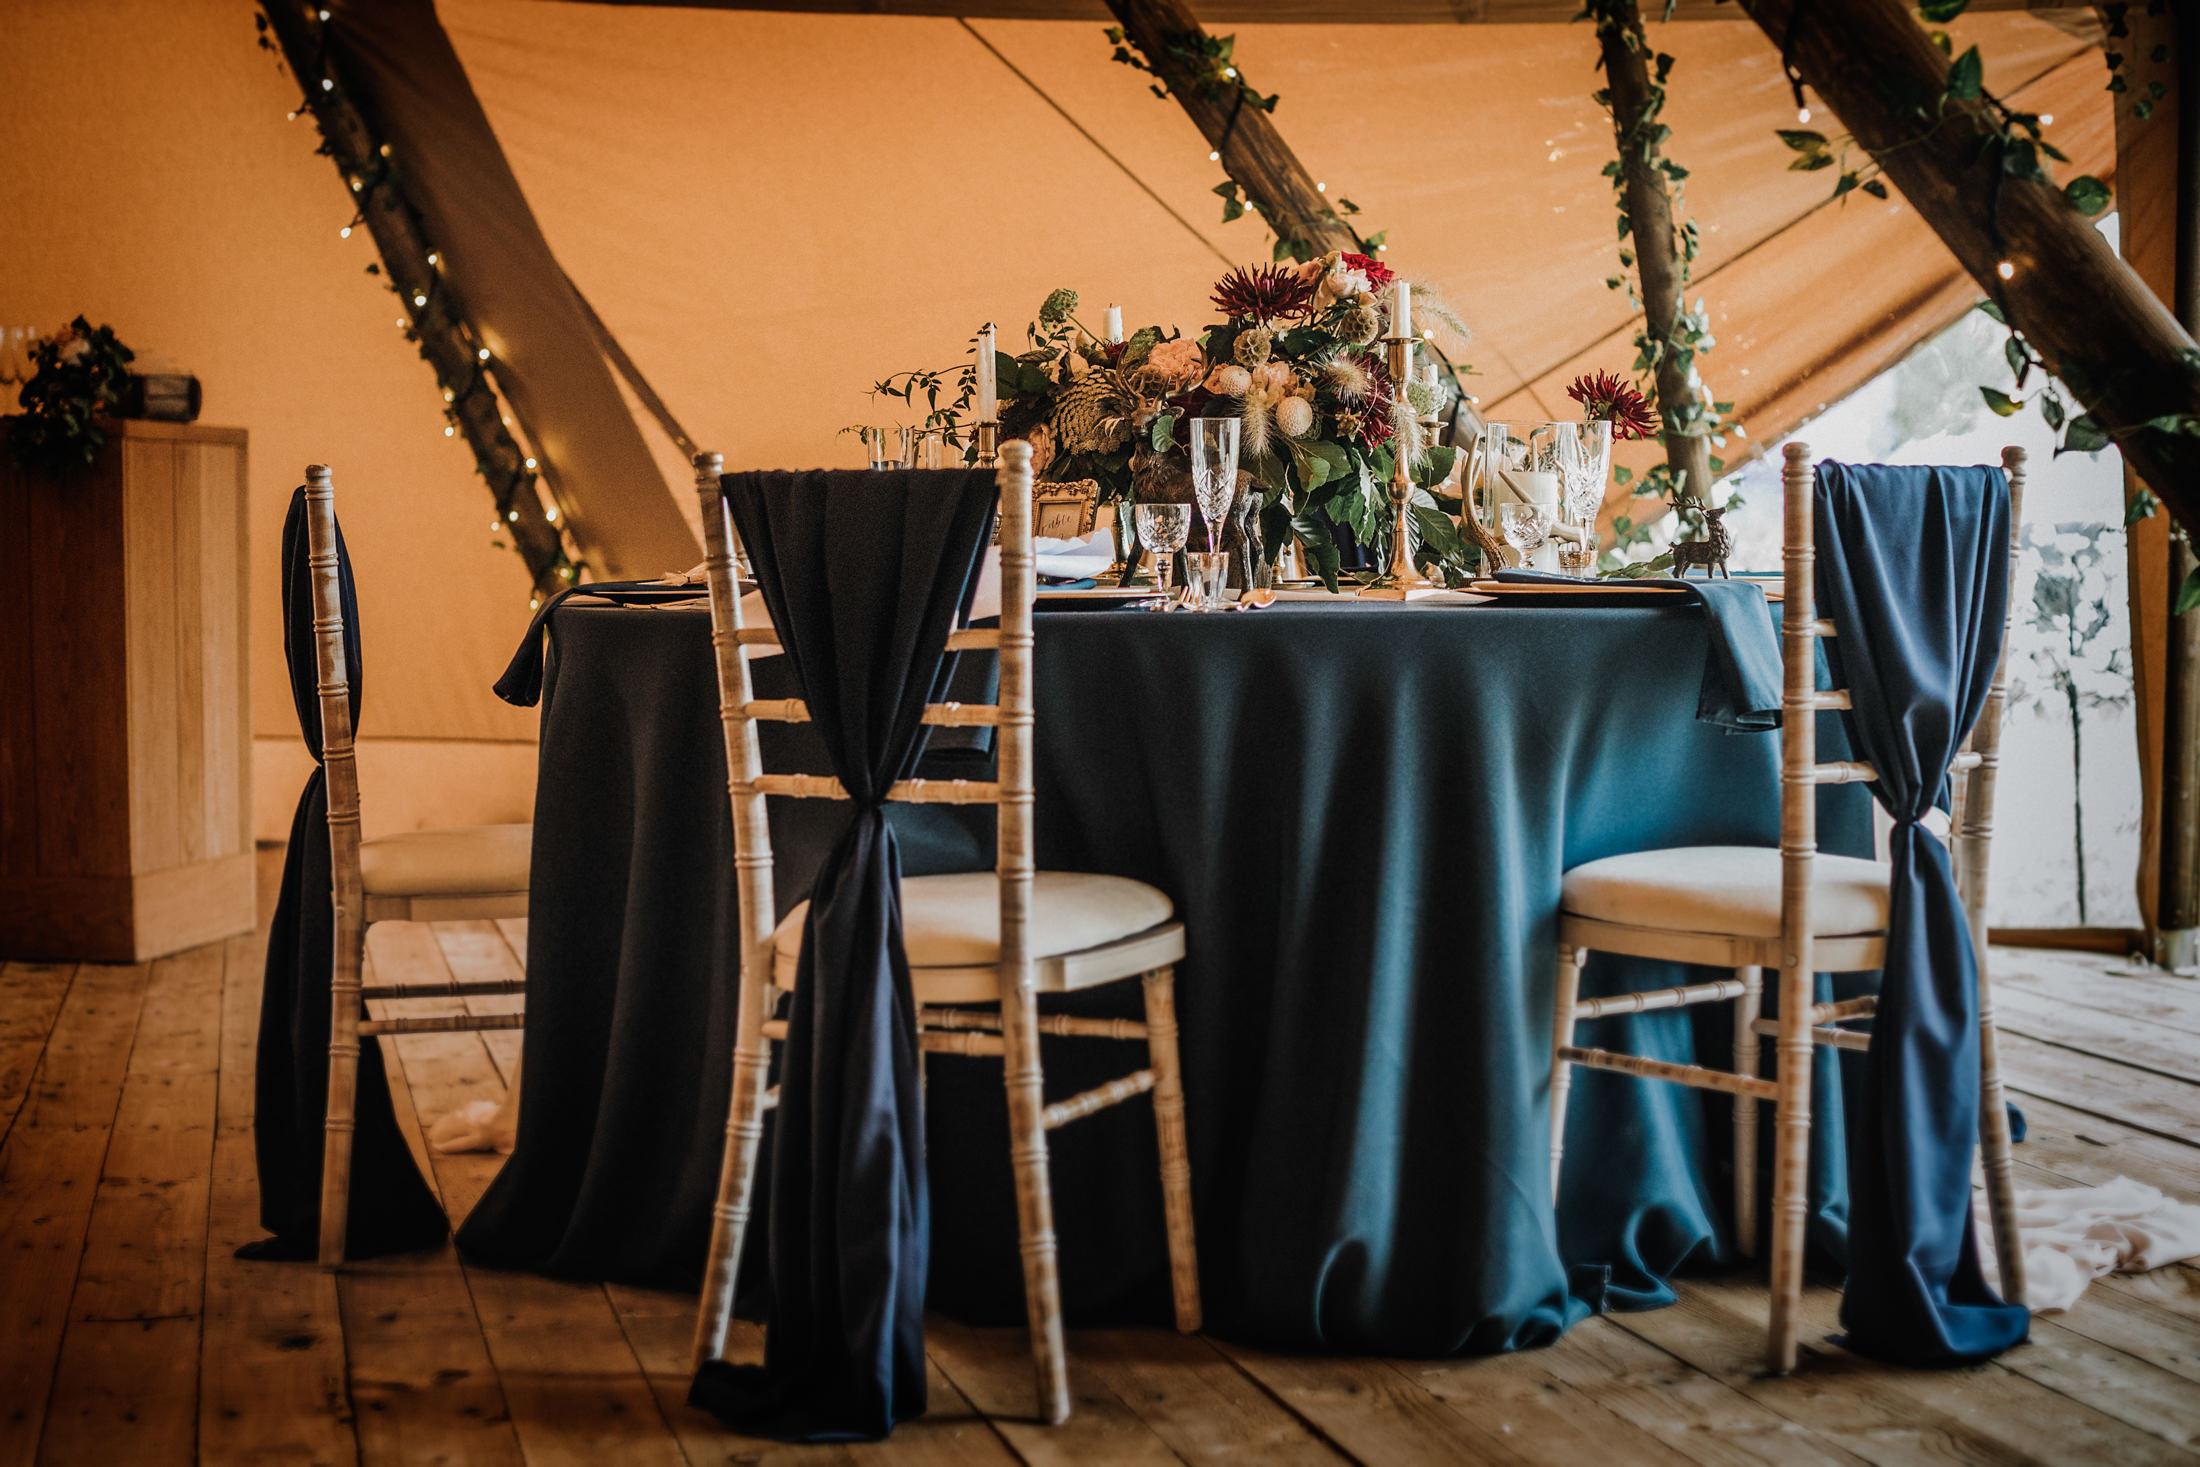 Woodland Wedding - nottingham outdoor wedding venue - east midlands wedding planner - tipi wedding styling